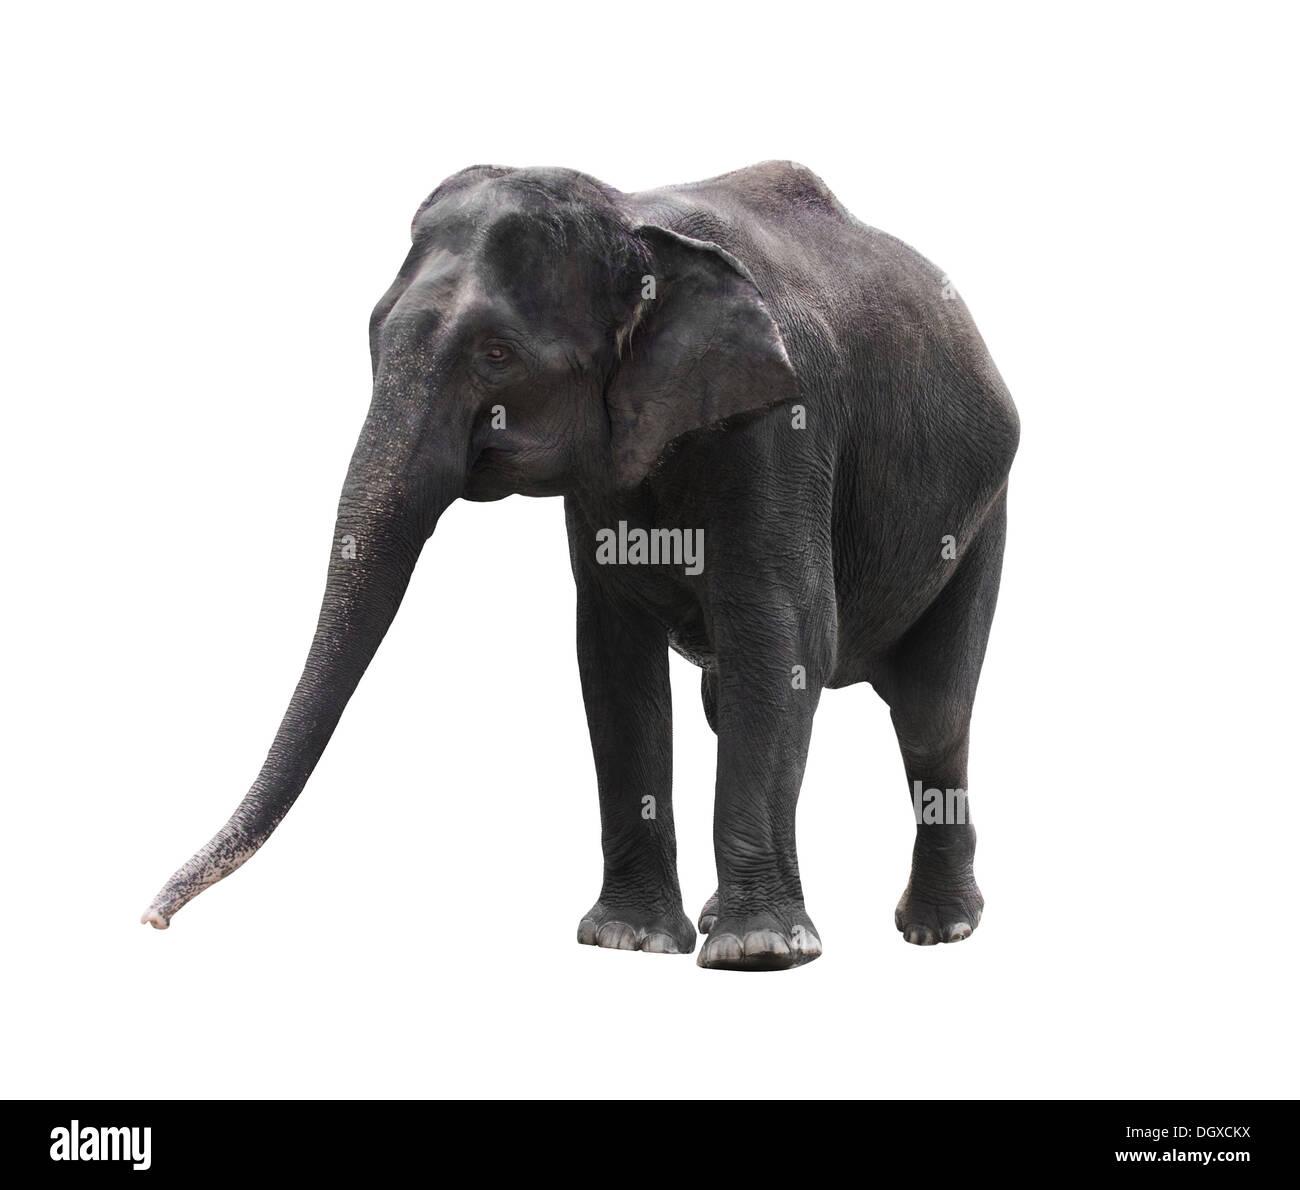 Elephant Isolated Earth Stock Photos & Elephant Isolated Earth Stock ...